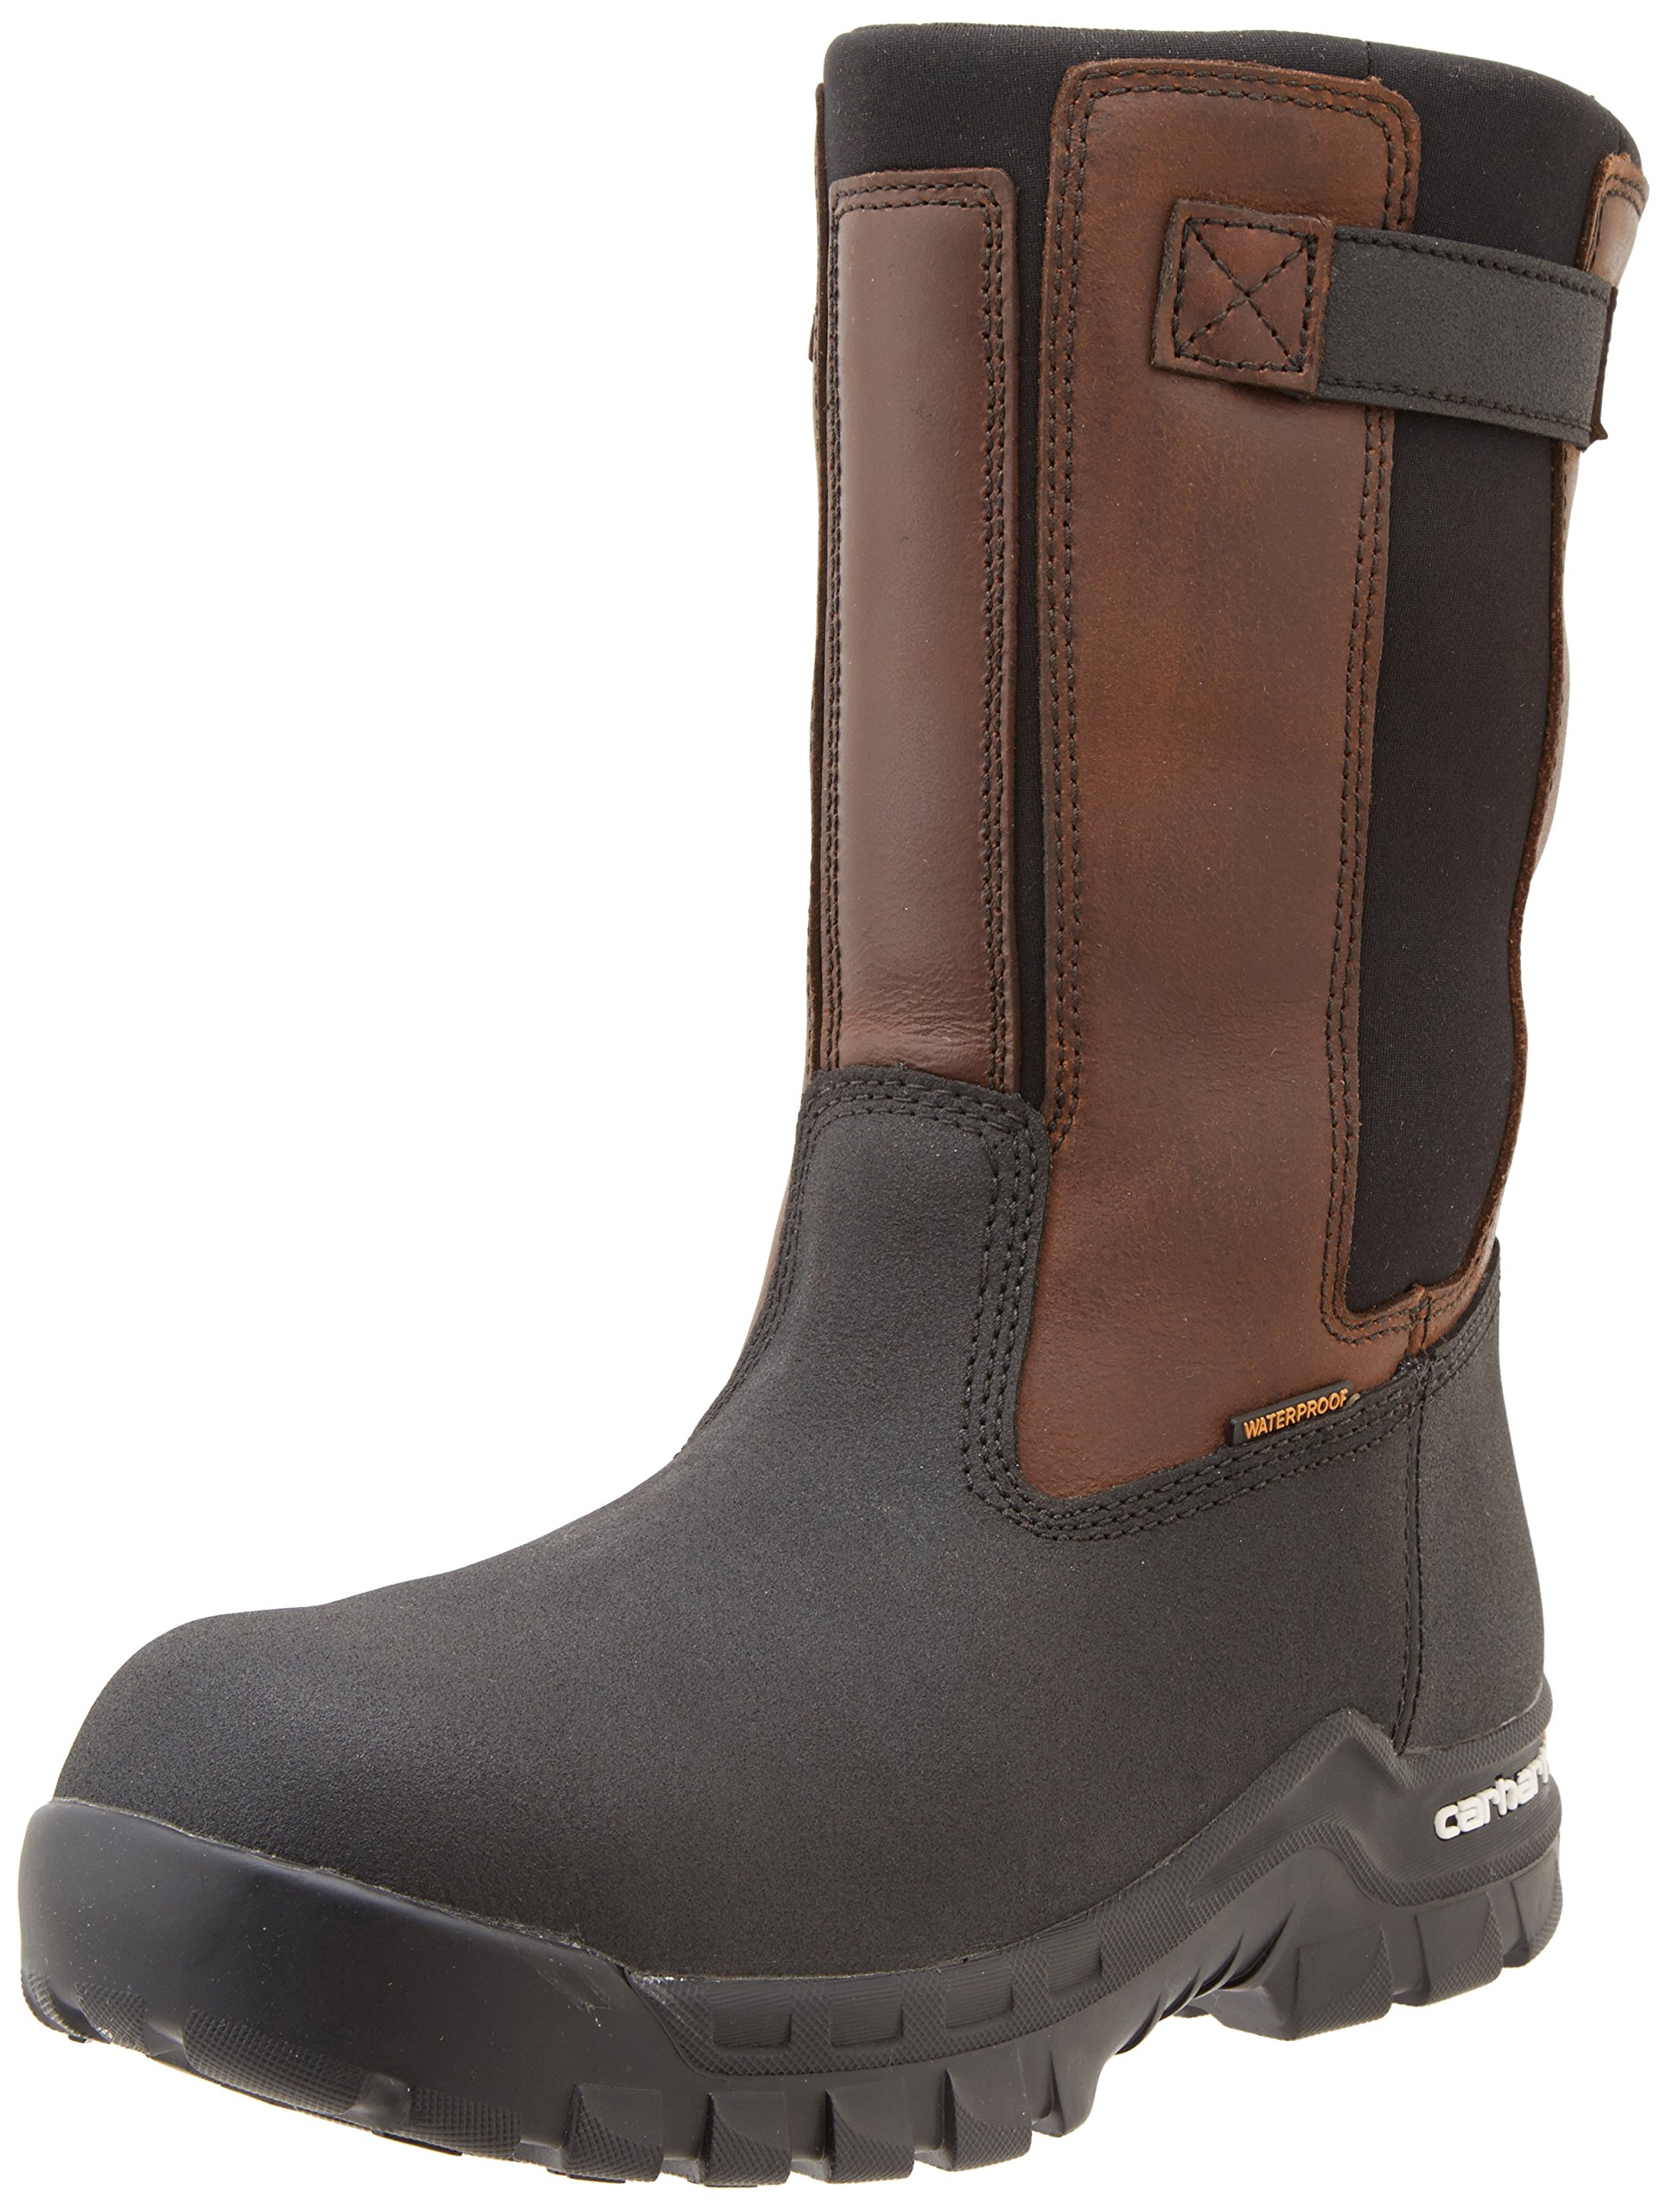 Carhartt Men's 10'' Wellington Waterproof Leather Pull On Boot CMF1391, Brown Oil Tan/Black Coated, 12 M US